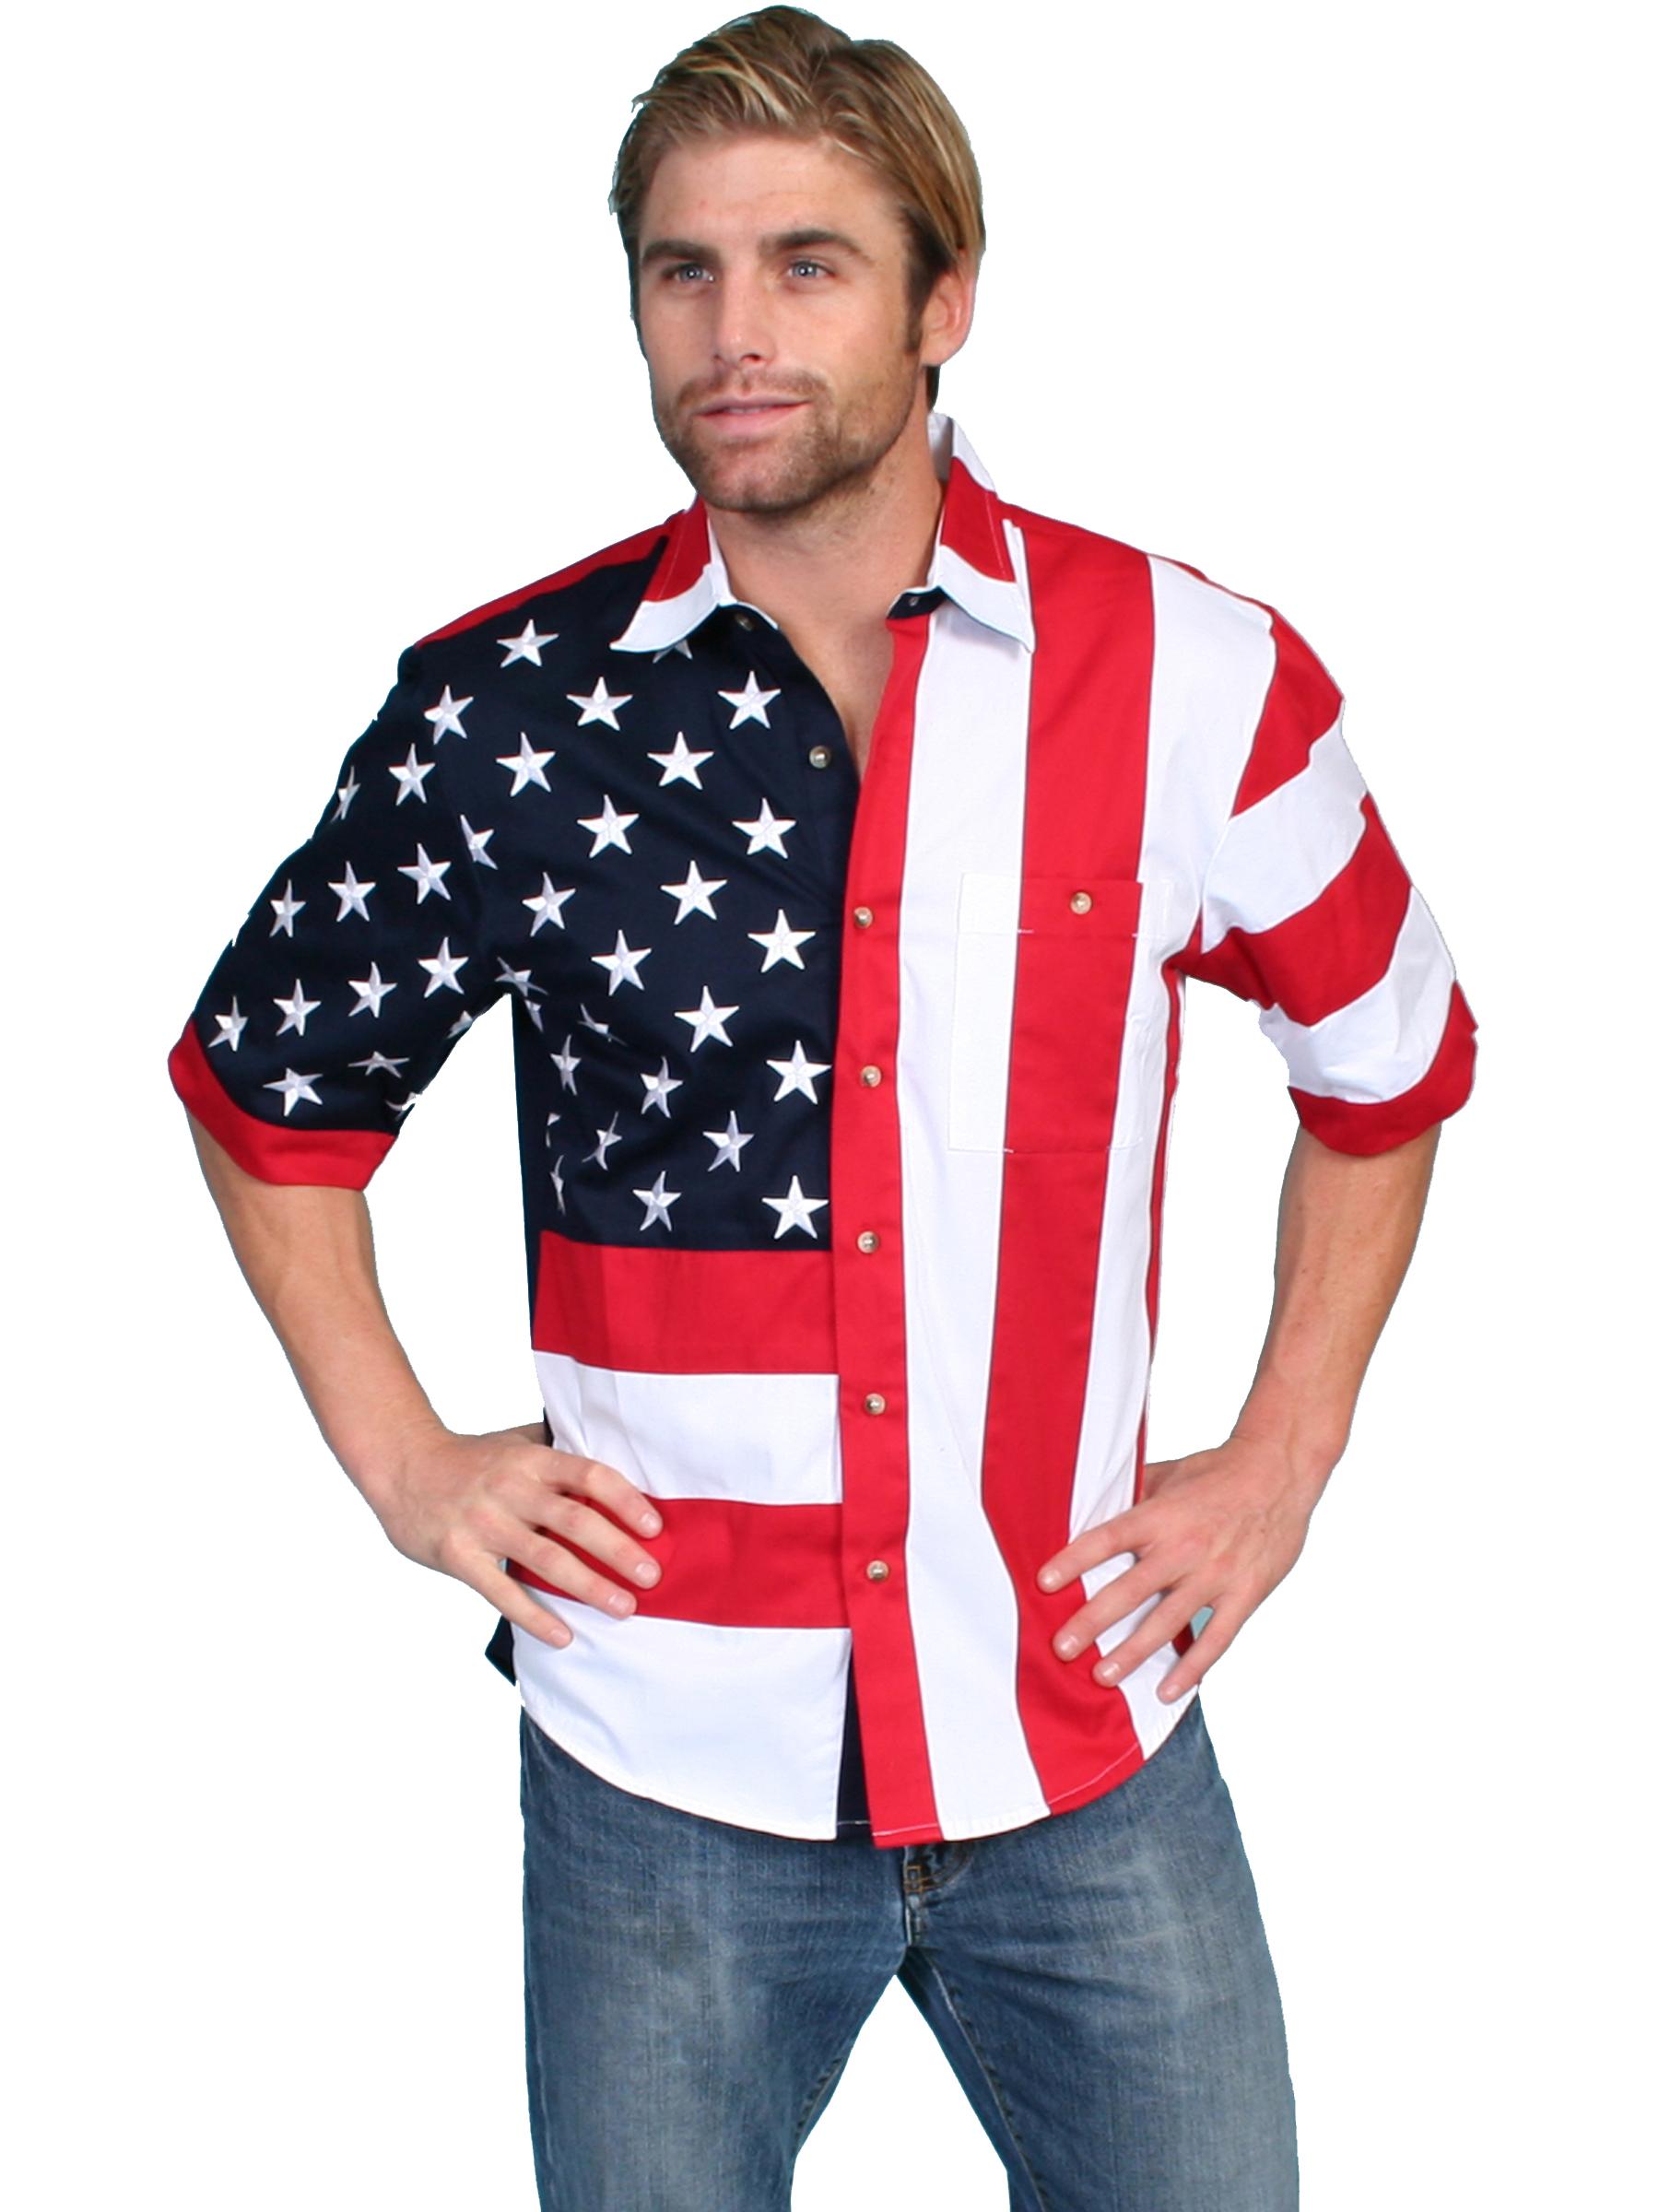 100% cotton button front short sleeve shirt